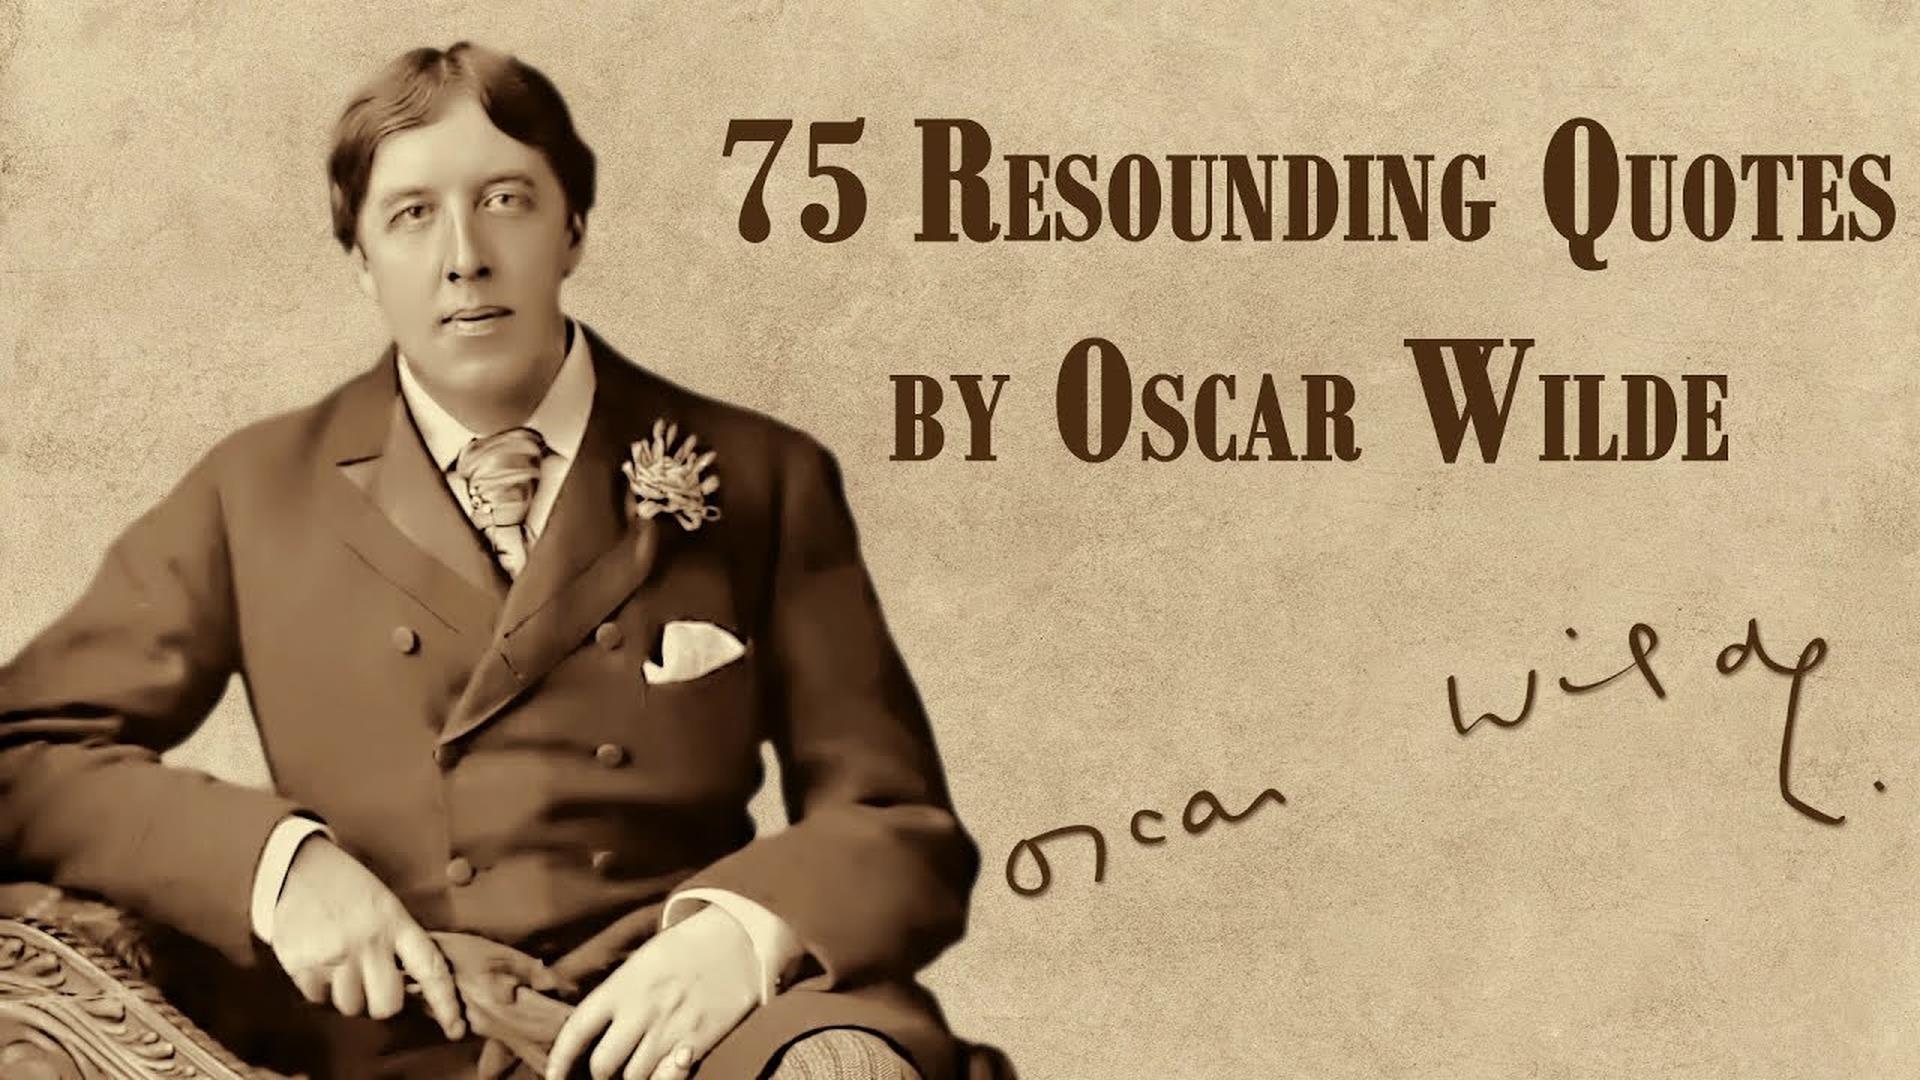 Frasi Su Se Stessi Oscar Wilde.Oscar Wilde Le Migliori Frasi Citazioni E Aforismi